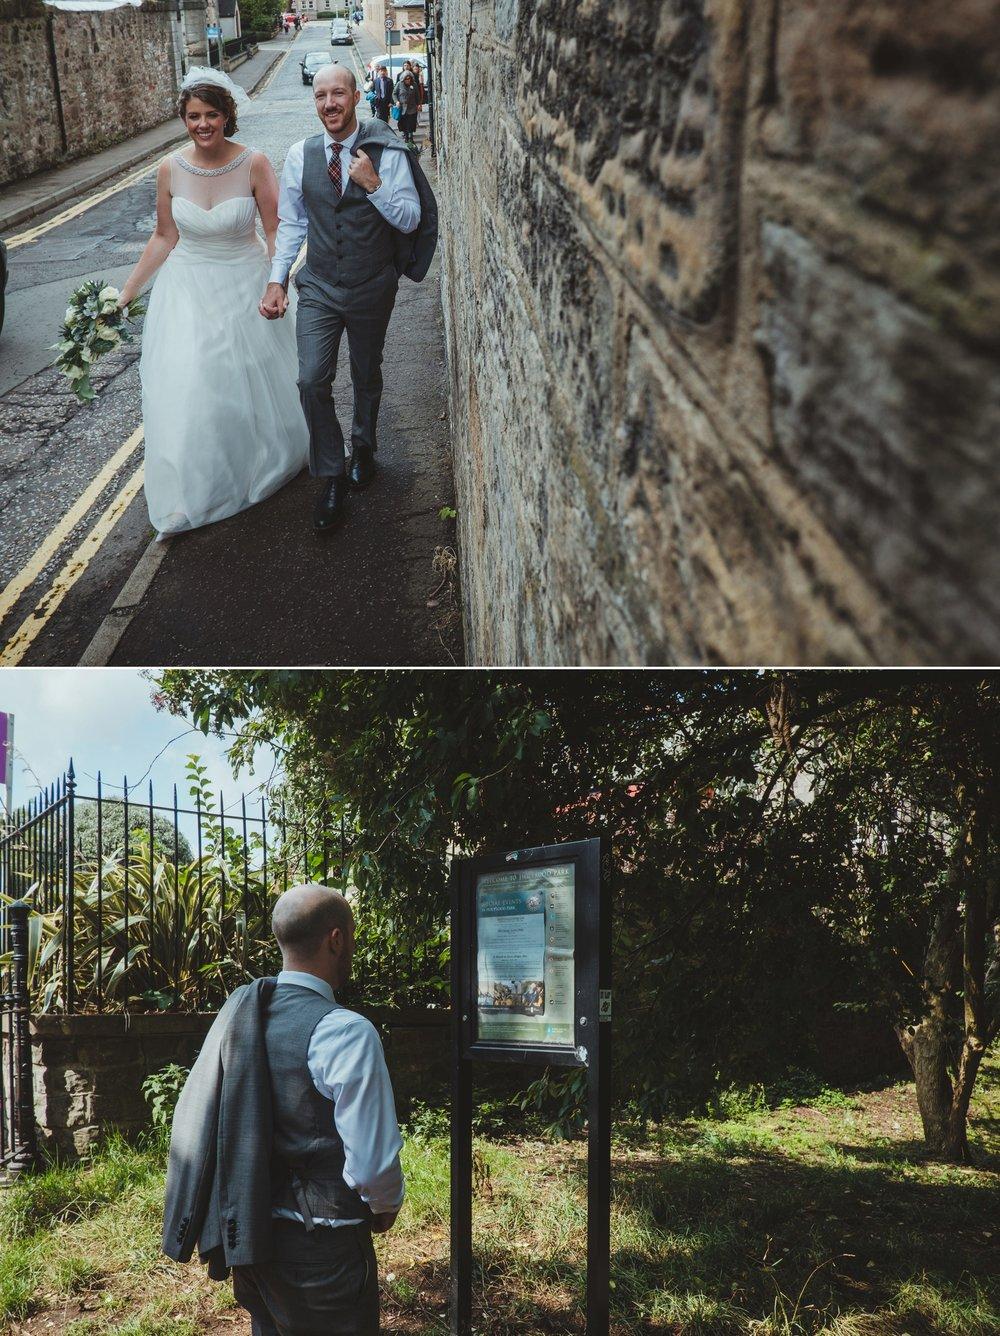 Angela___Andy_s_Edinburgh_elopement_by_Barry_Forshaw_0236.jpg